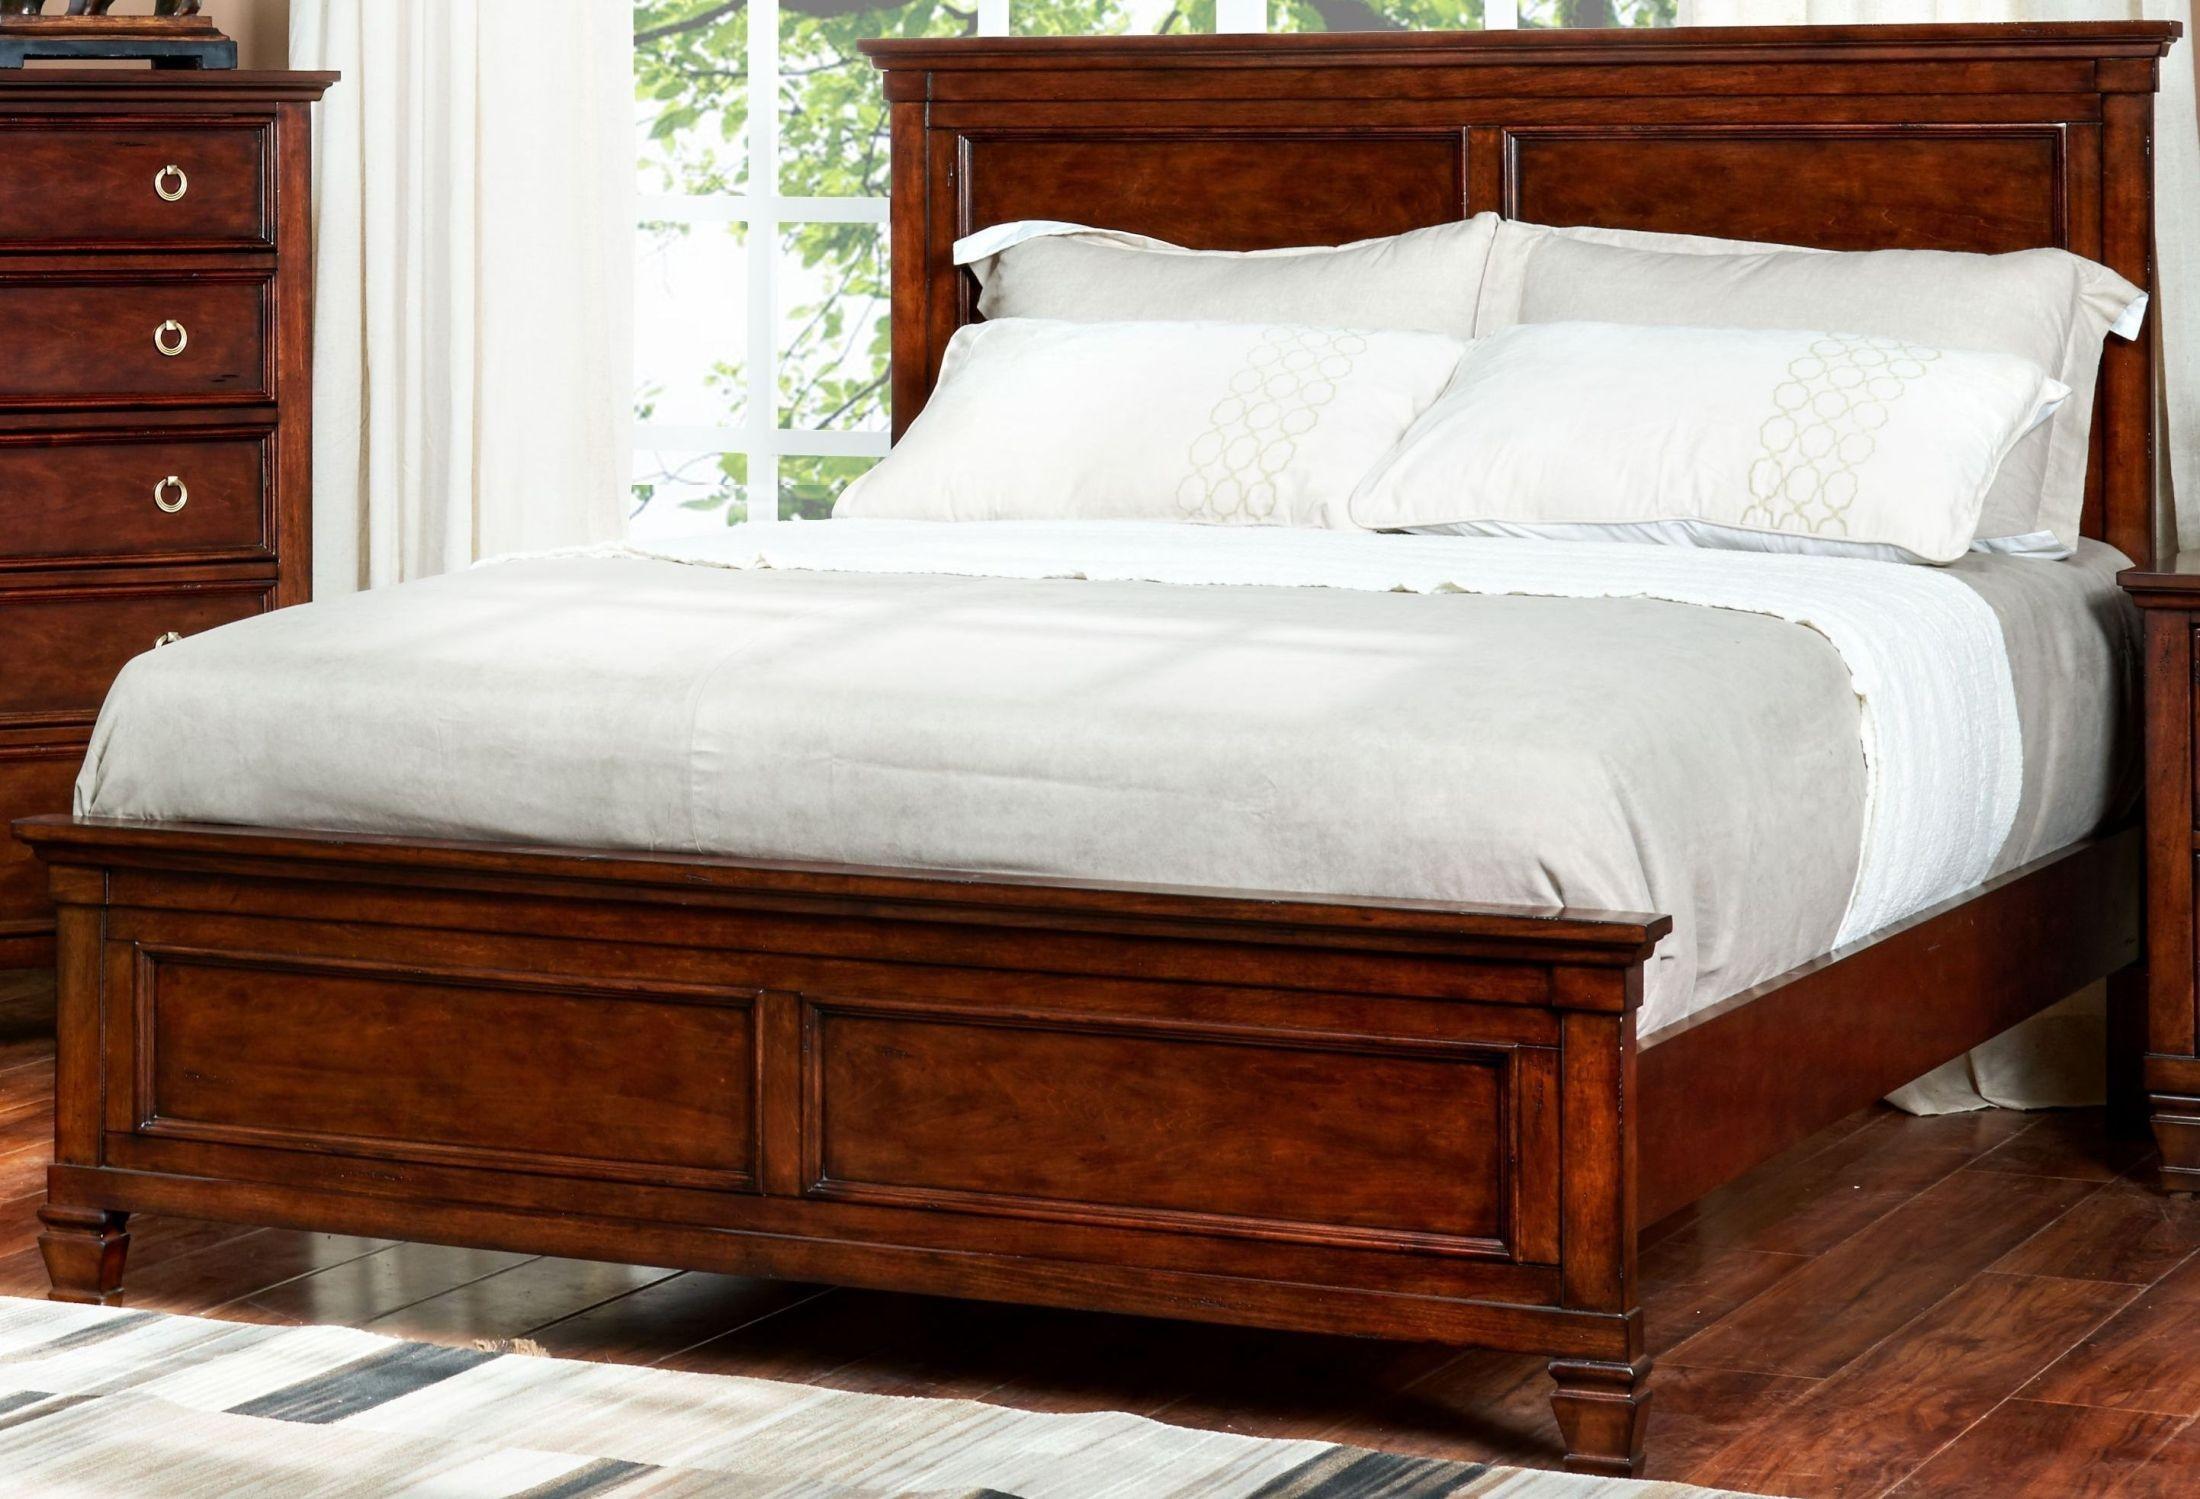 Tamarack Brown Cherry Queen Panel Bed from New Classic | Coleman ...